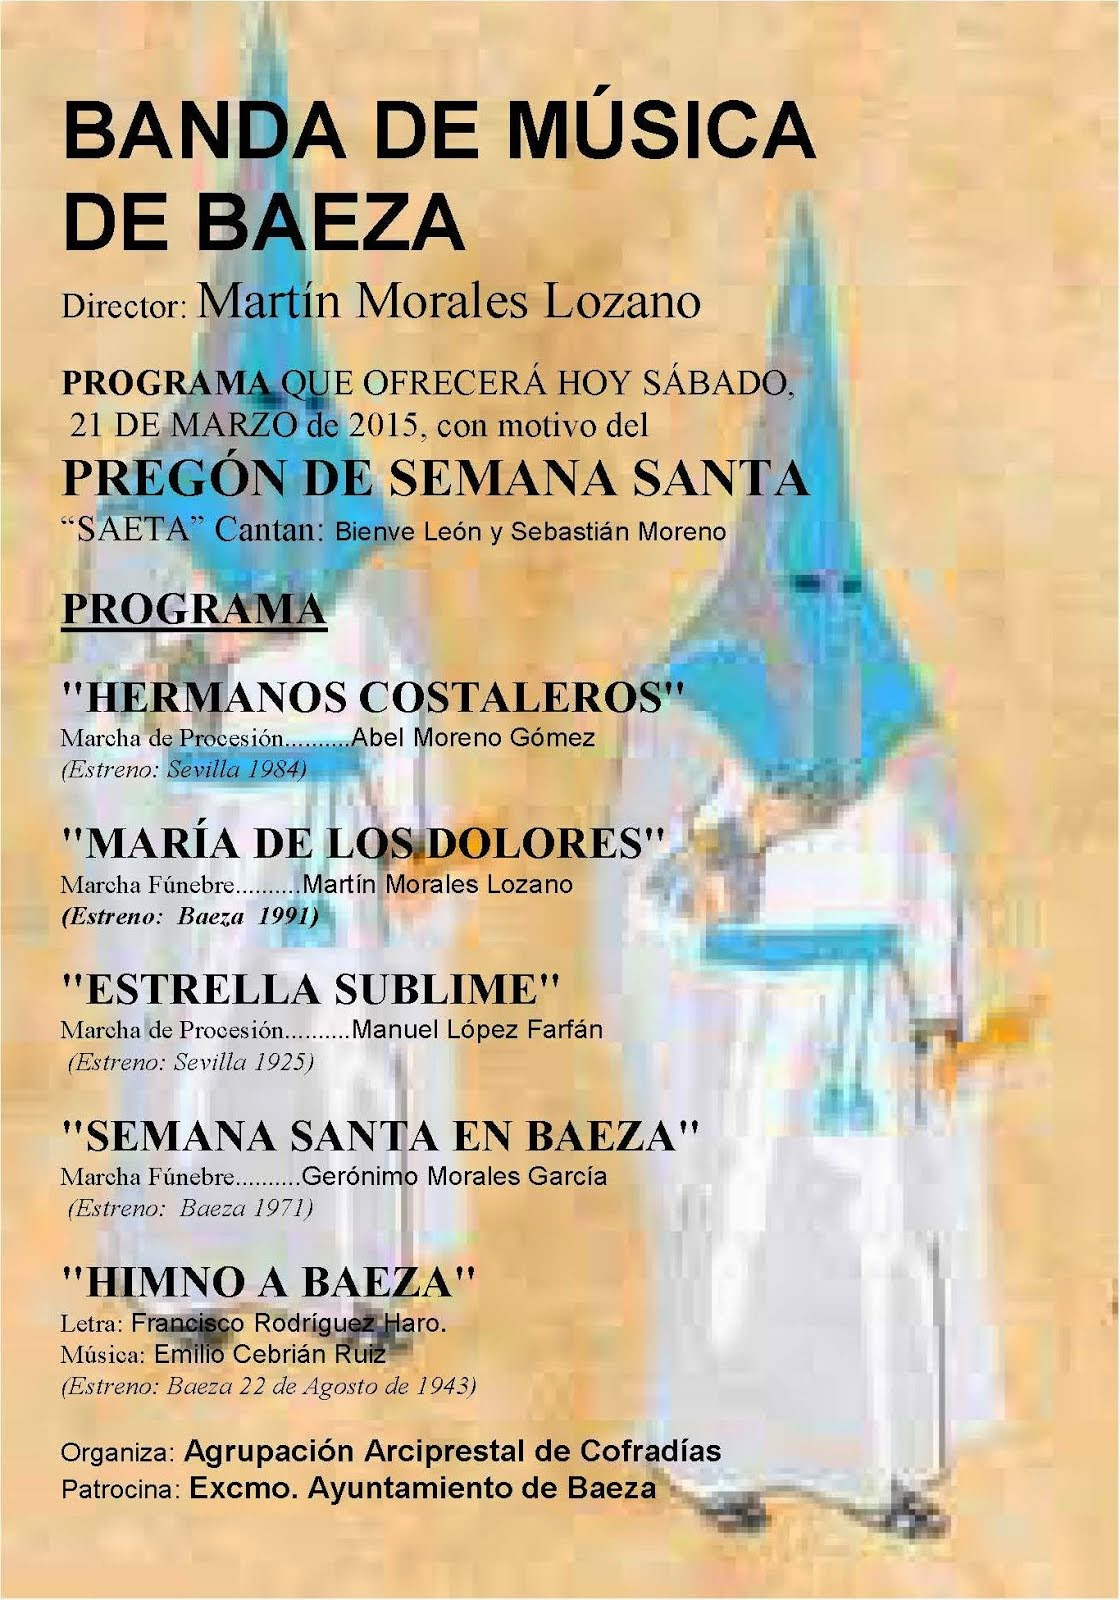 PREGÓN DE SEMANA SANTA BAEZA 2015 - BANDA DE MÚSICA DE BAEZA - CONCIERTO